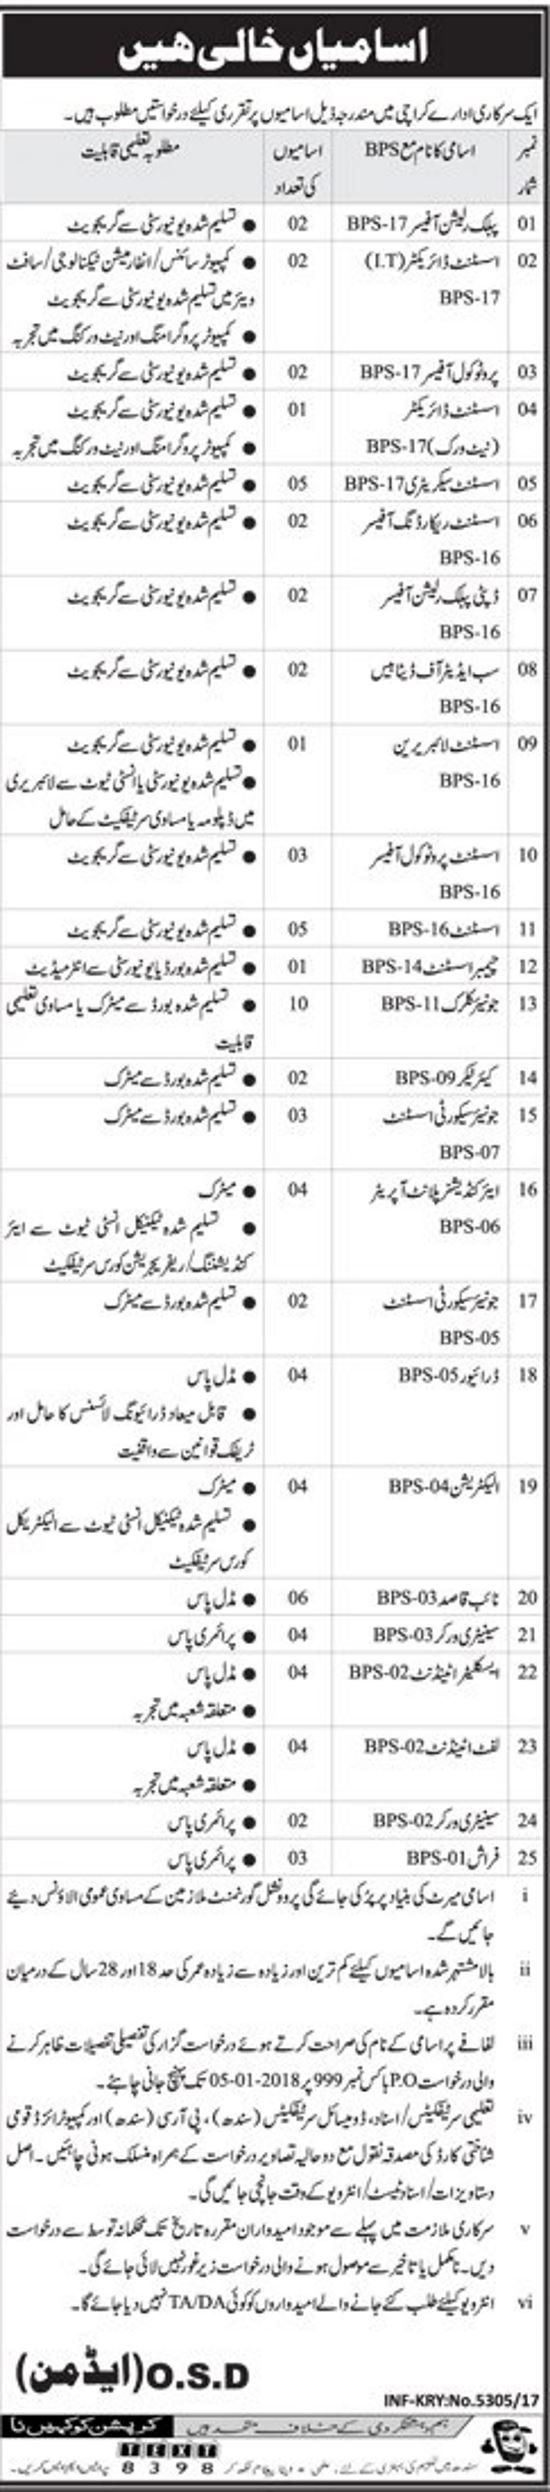 PO Box 999 Public Sector Organization Karachi Jobs 2018